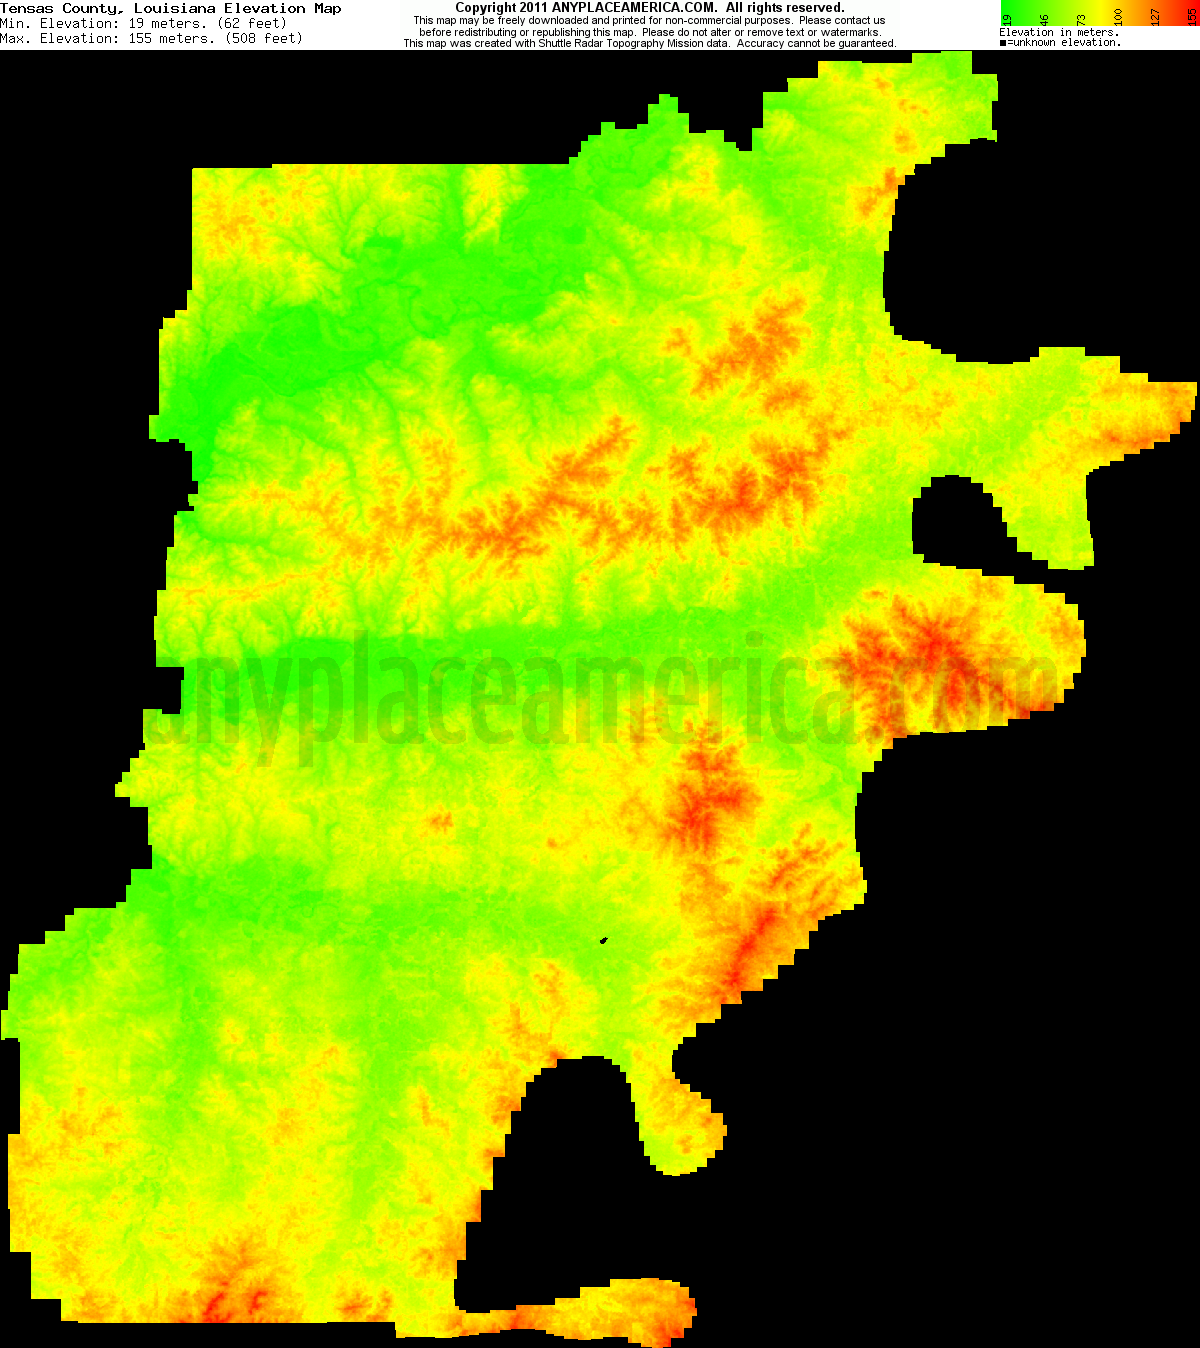 Free Tensas Parish Louisiana Topo Maps Elevations